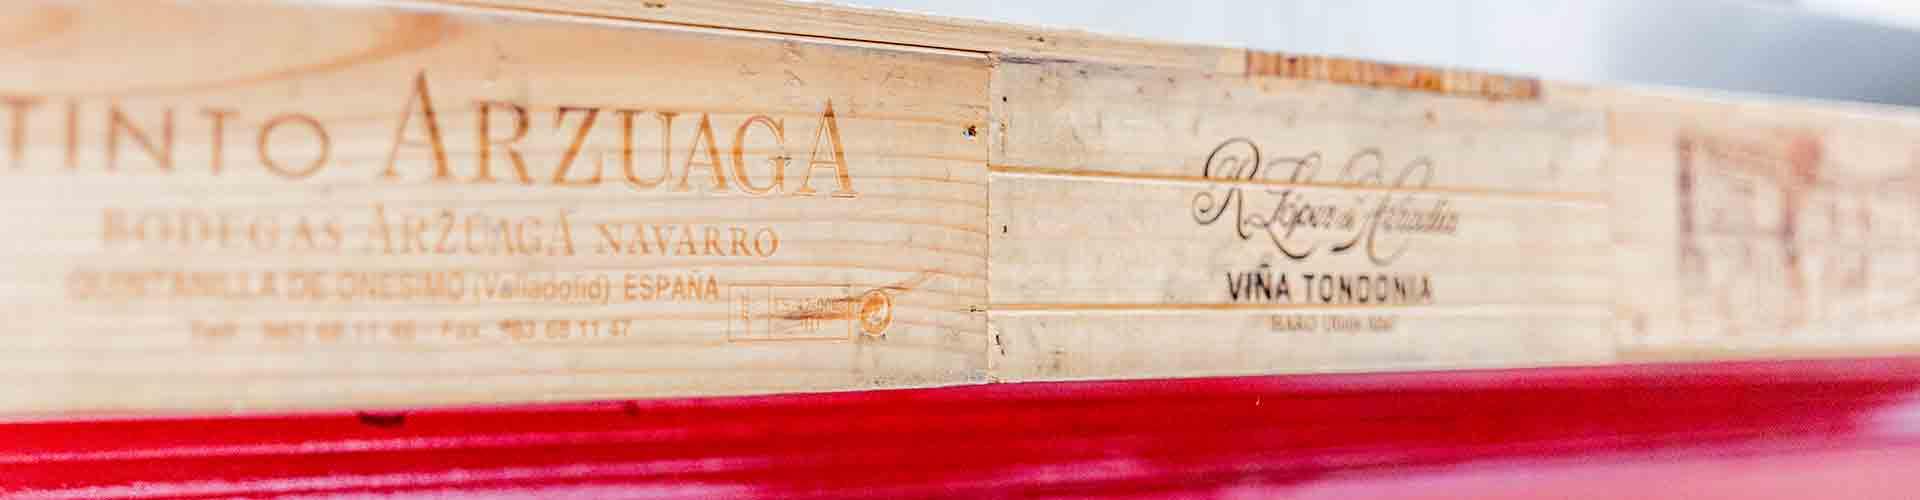 Holzdetails spanische Beschriftungen Wein